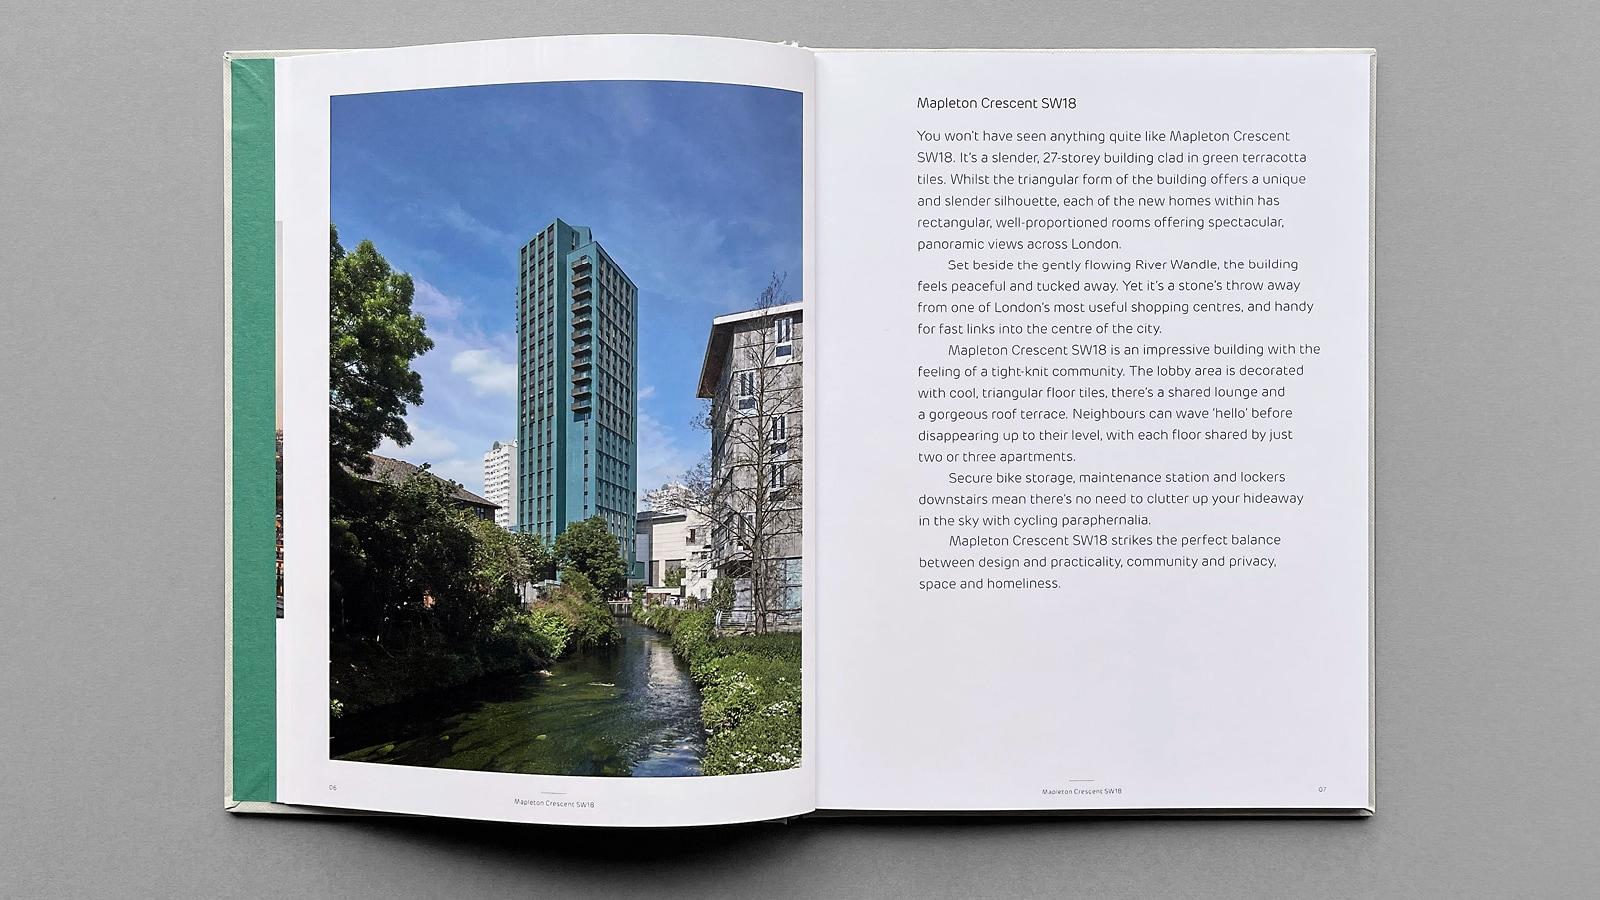 property-marketing-design-architecture-building-book-brochure-milton-keynes-london5